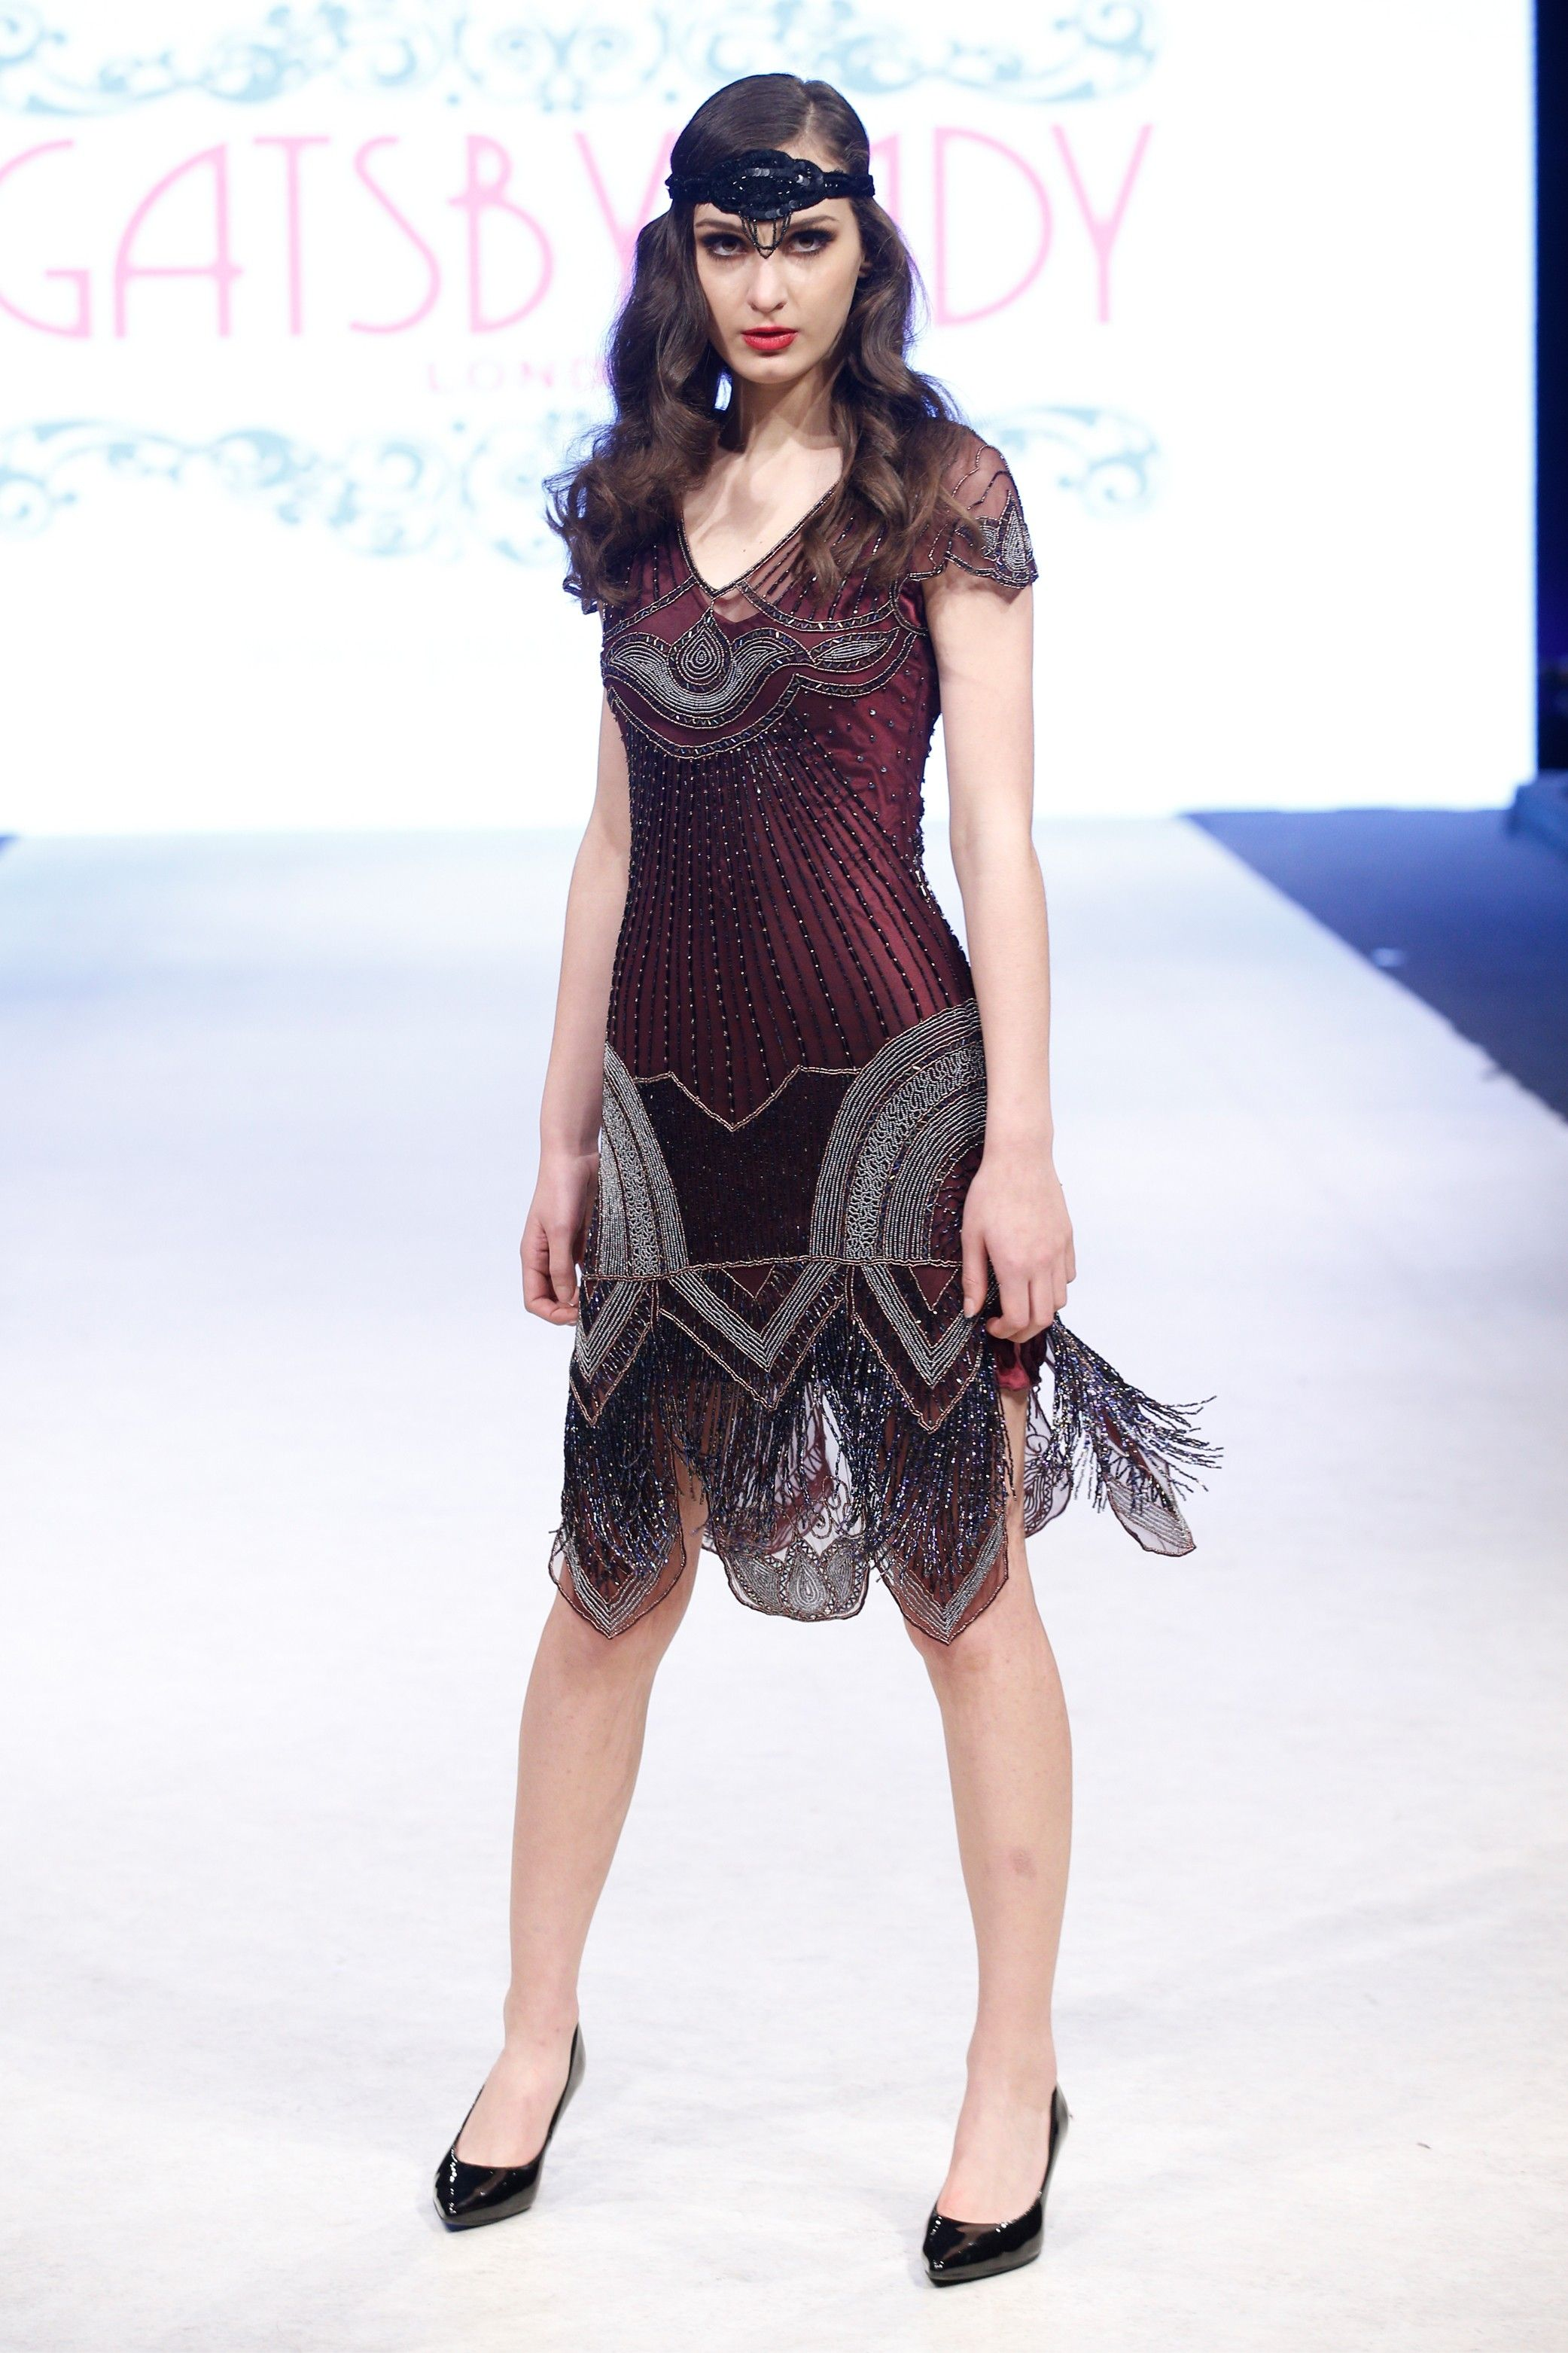 Gatsbylady beatrice us vintage inspired fringe flapper dress in